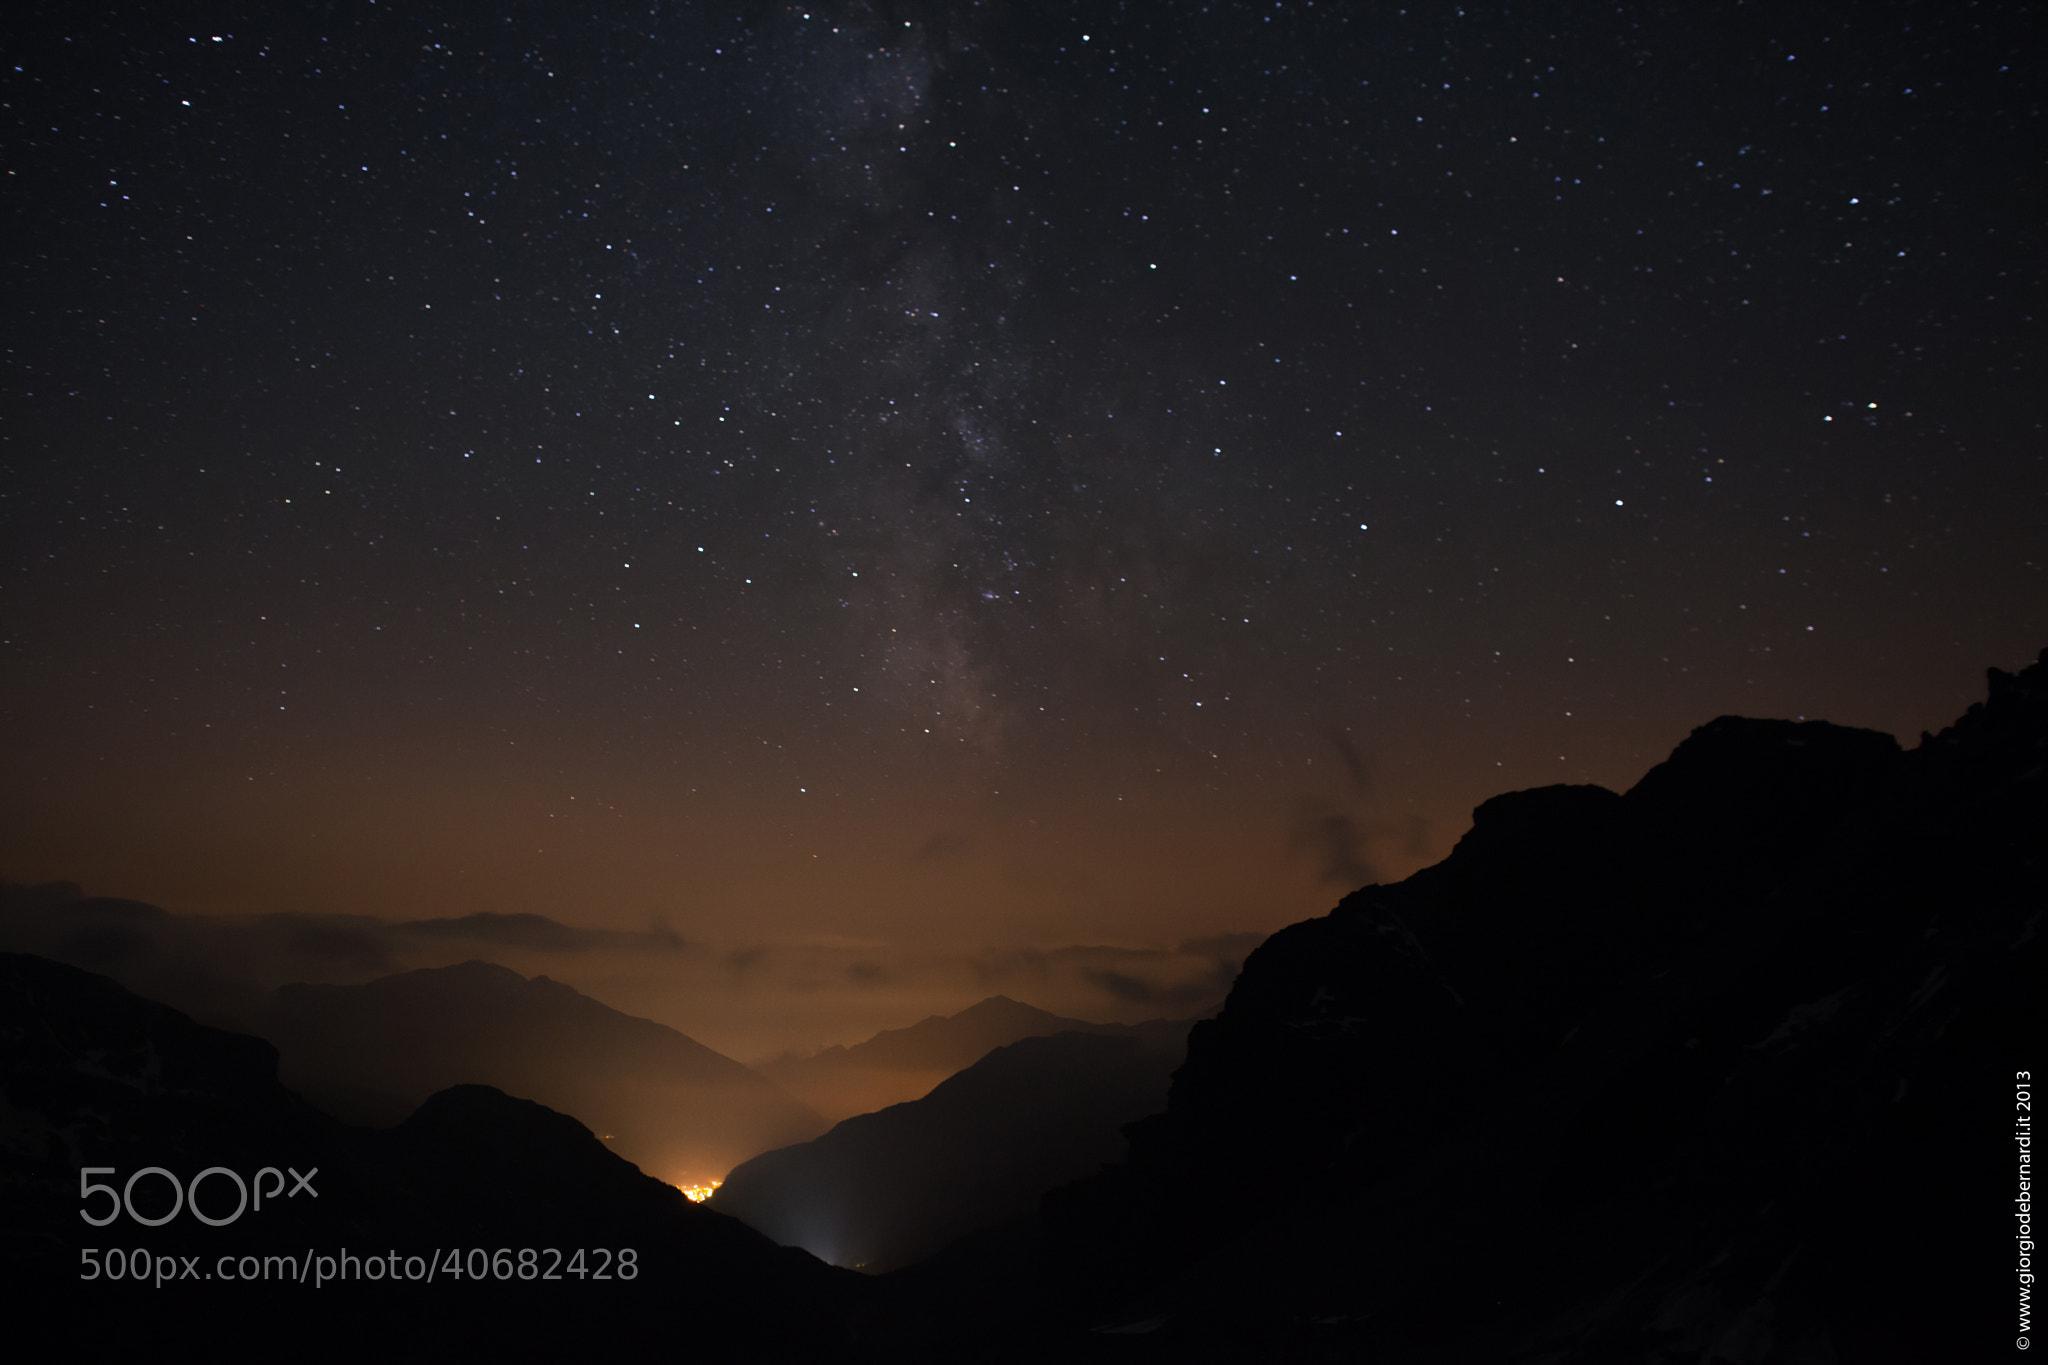 Photograph Dal rifugio Mezzalama by giorgio debernardi on 500px